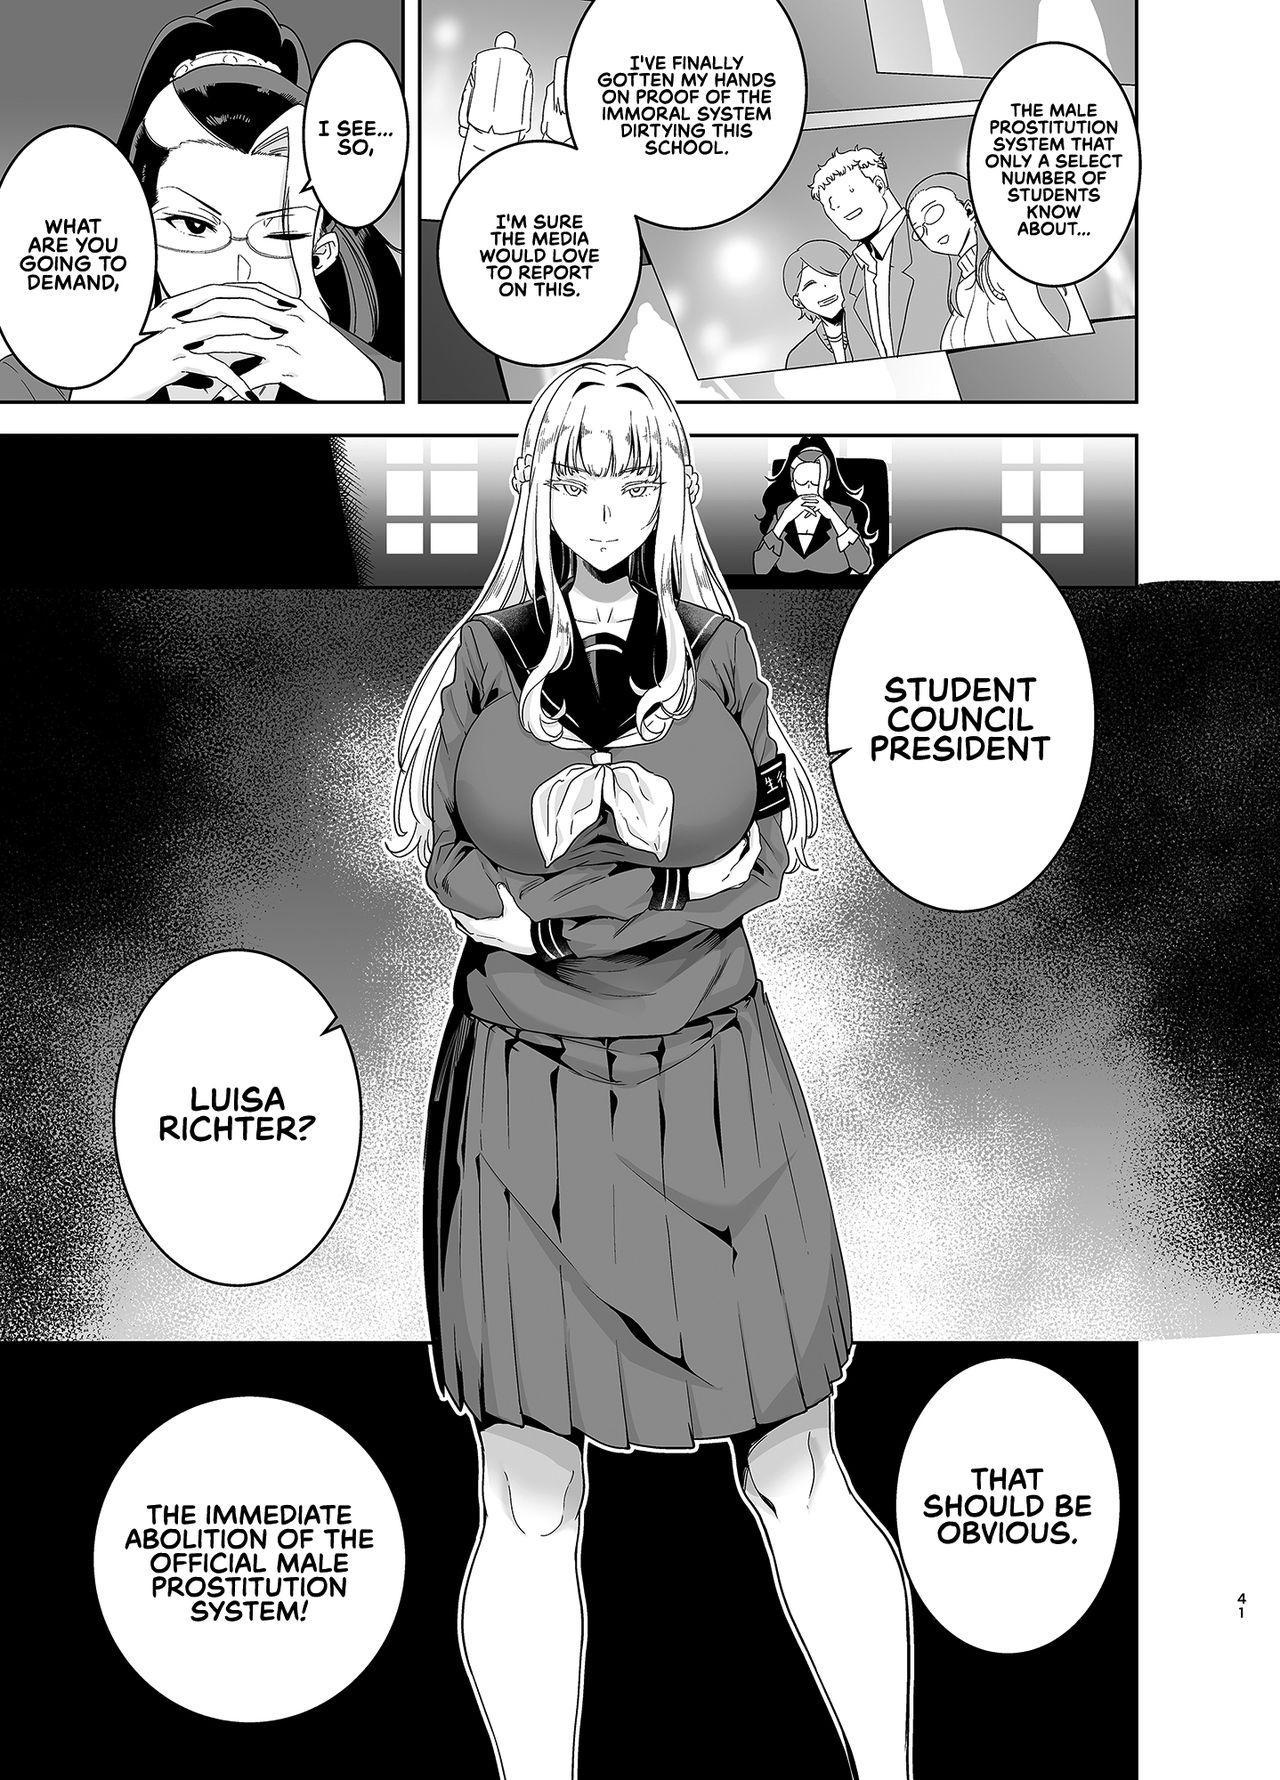 [DOLL PLAY (Kurosu Gatari)] Seika Jogakuin Koutoubu Kounin Sao Oji-san 3 | Seika Girls' Academy Official Rod Oji-san 3 [English] [RedLantern] [Digital] 40